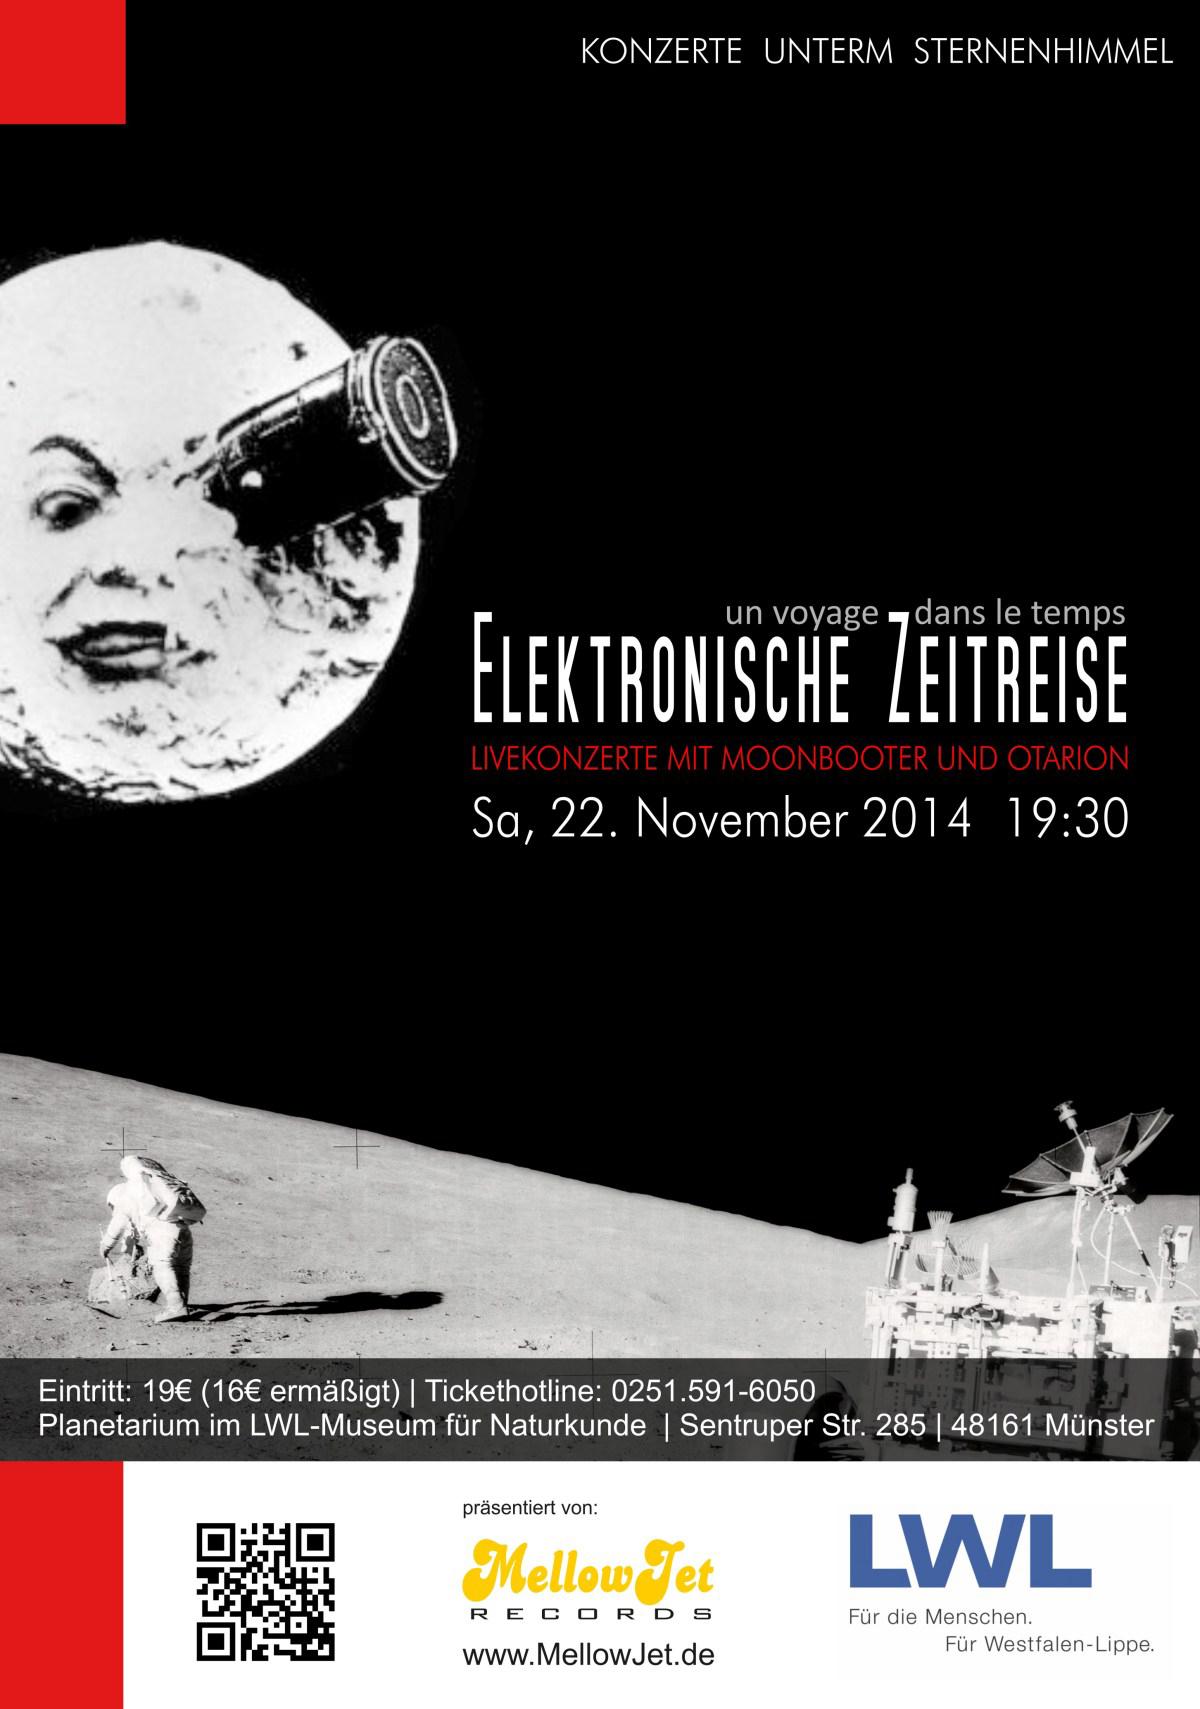 Bilddatei: 2014 Planetarium Münster 2 moonbooter Otarion V2.jpg